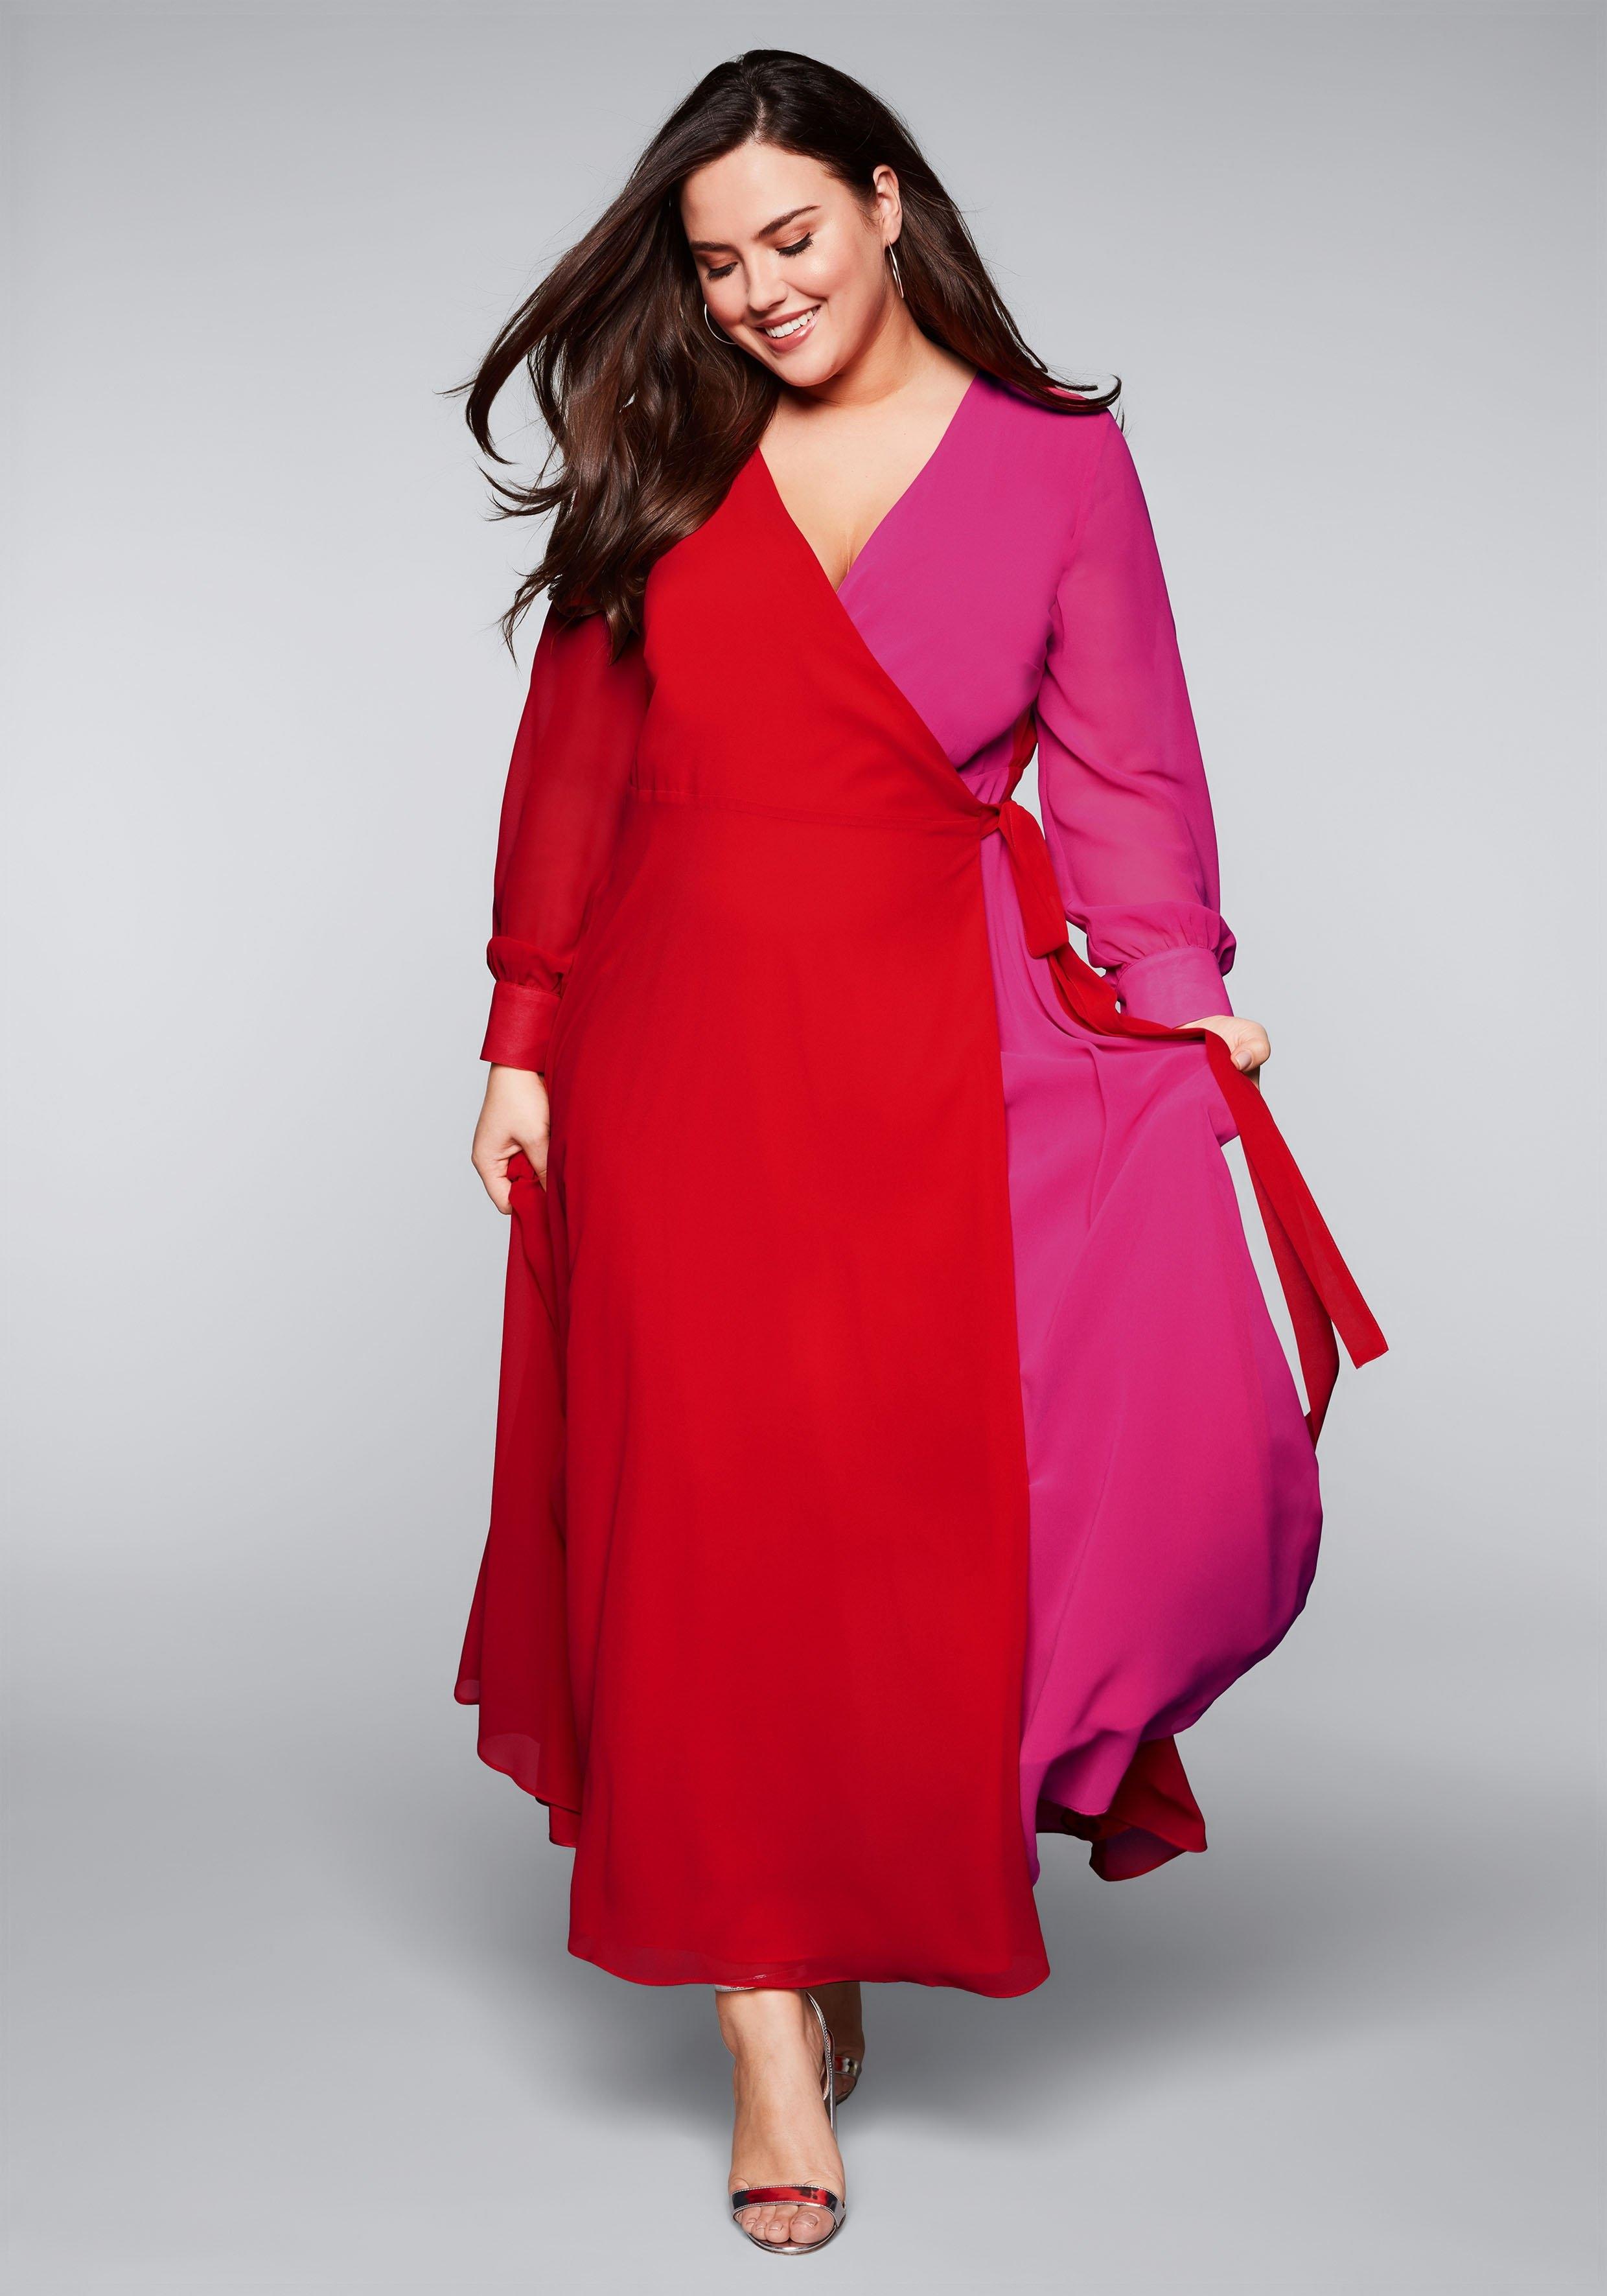 sheego by Miyabi Kawai maxi-jurk bestellen: 14 dagen bedenktijd